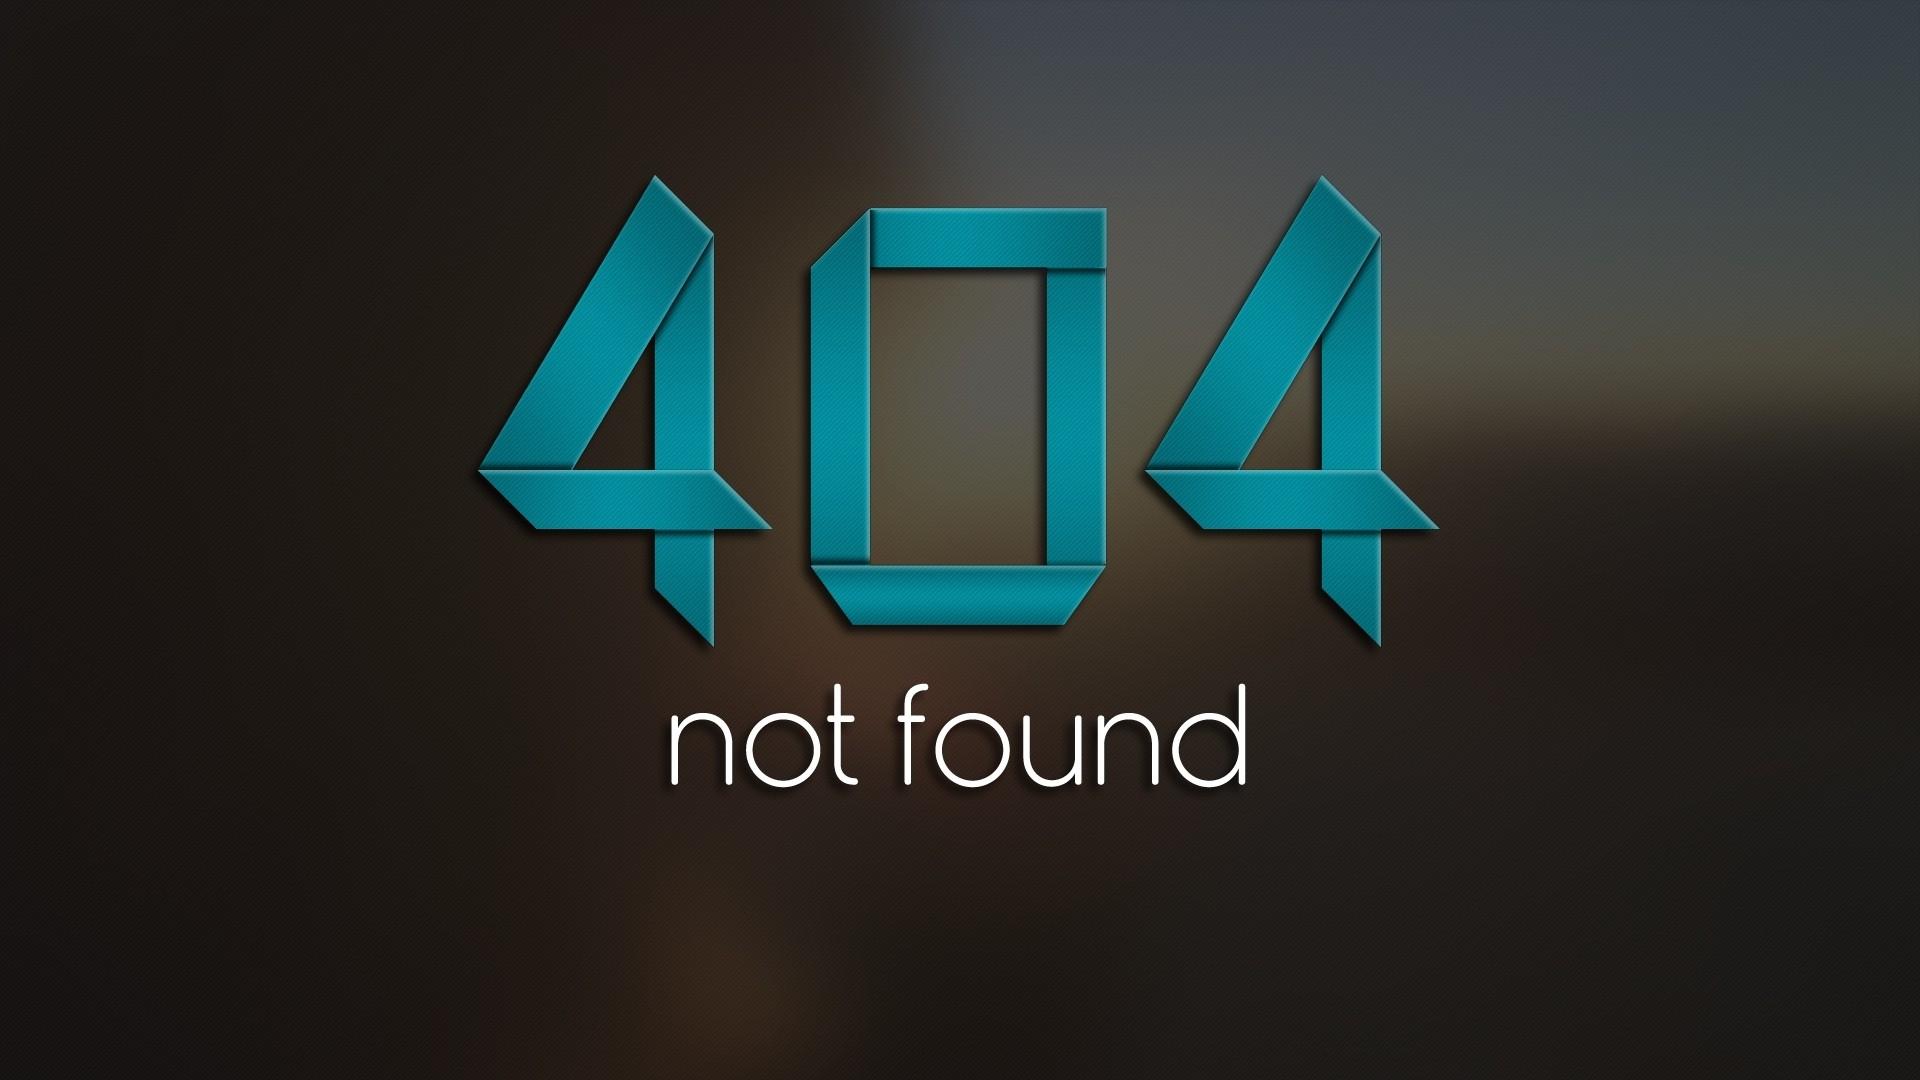 Error 404 Wallpaper image hd